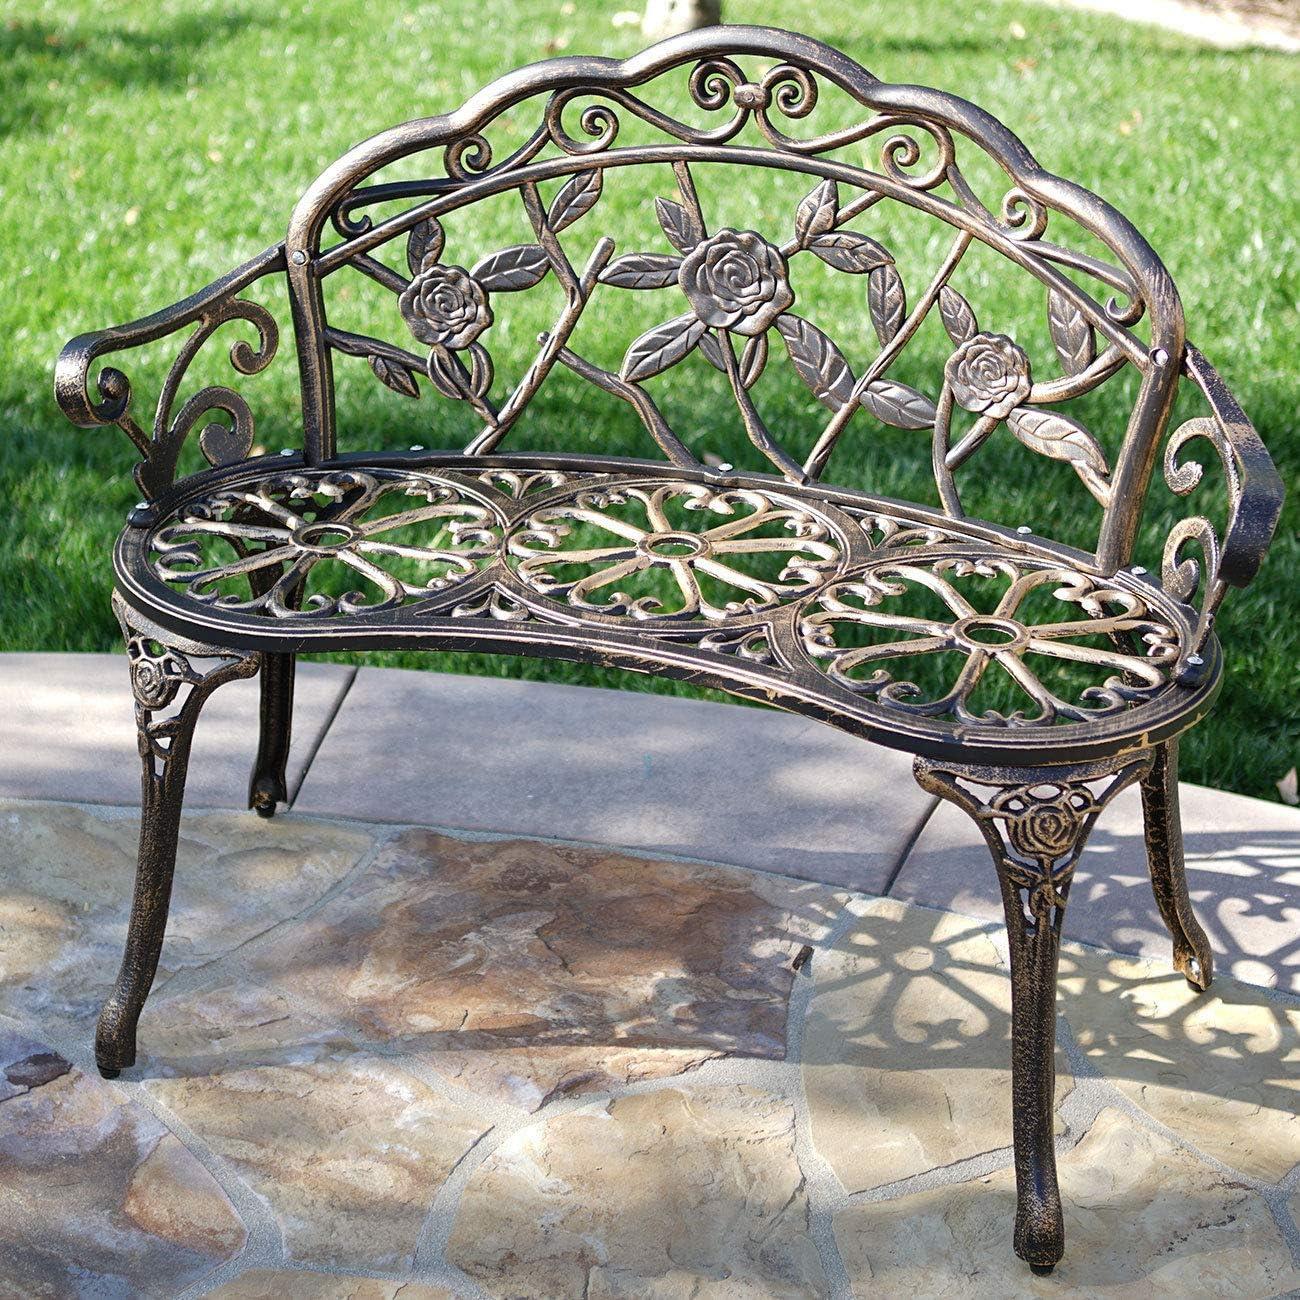 Patio Garden Outdoor Bench Cast Aluminum Iron Garden Yard Solid Construction